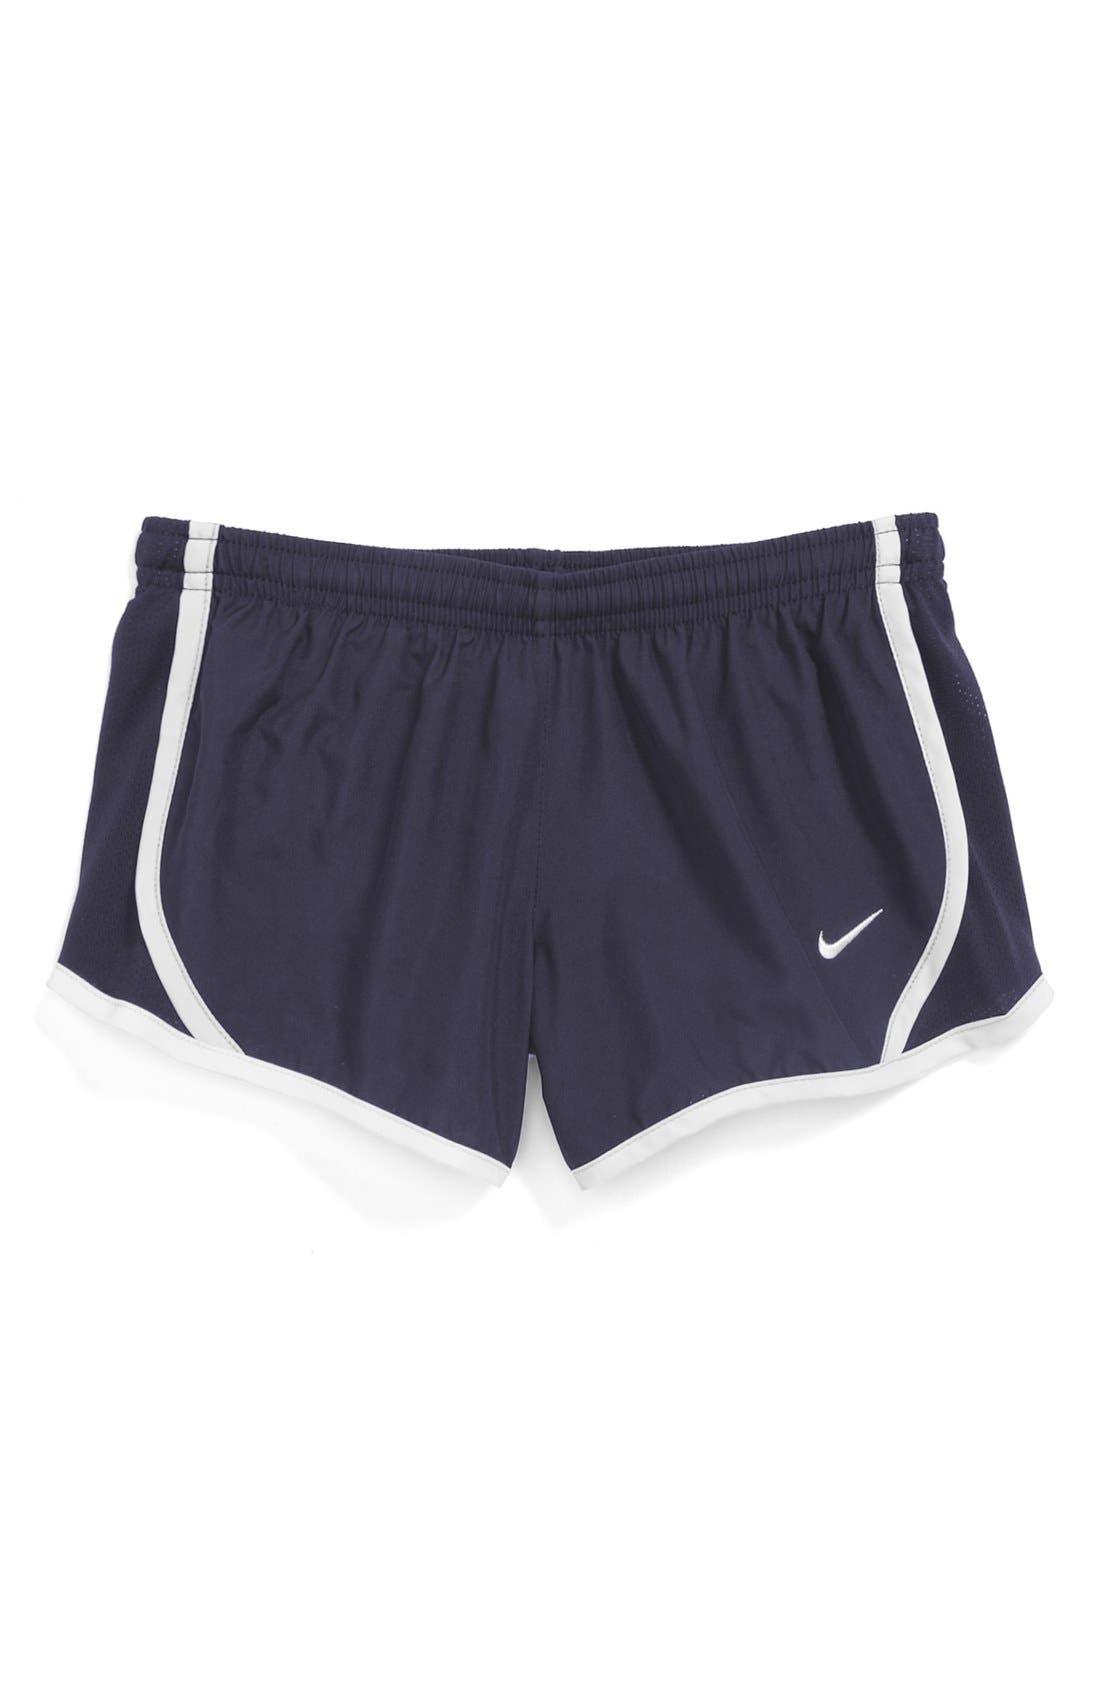 Alternate Image 1 Selected - Nike 'Tempo' Track Shorts (Big Girls)